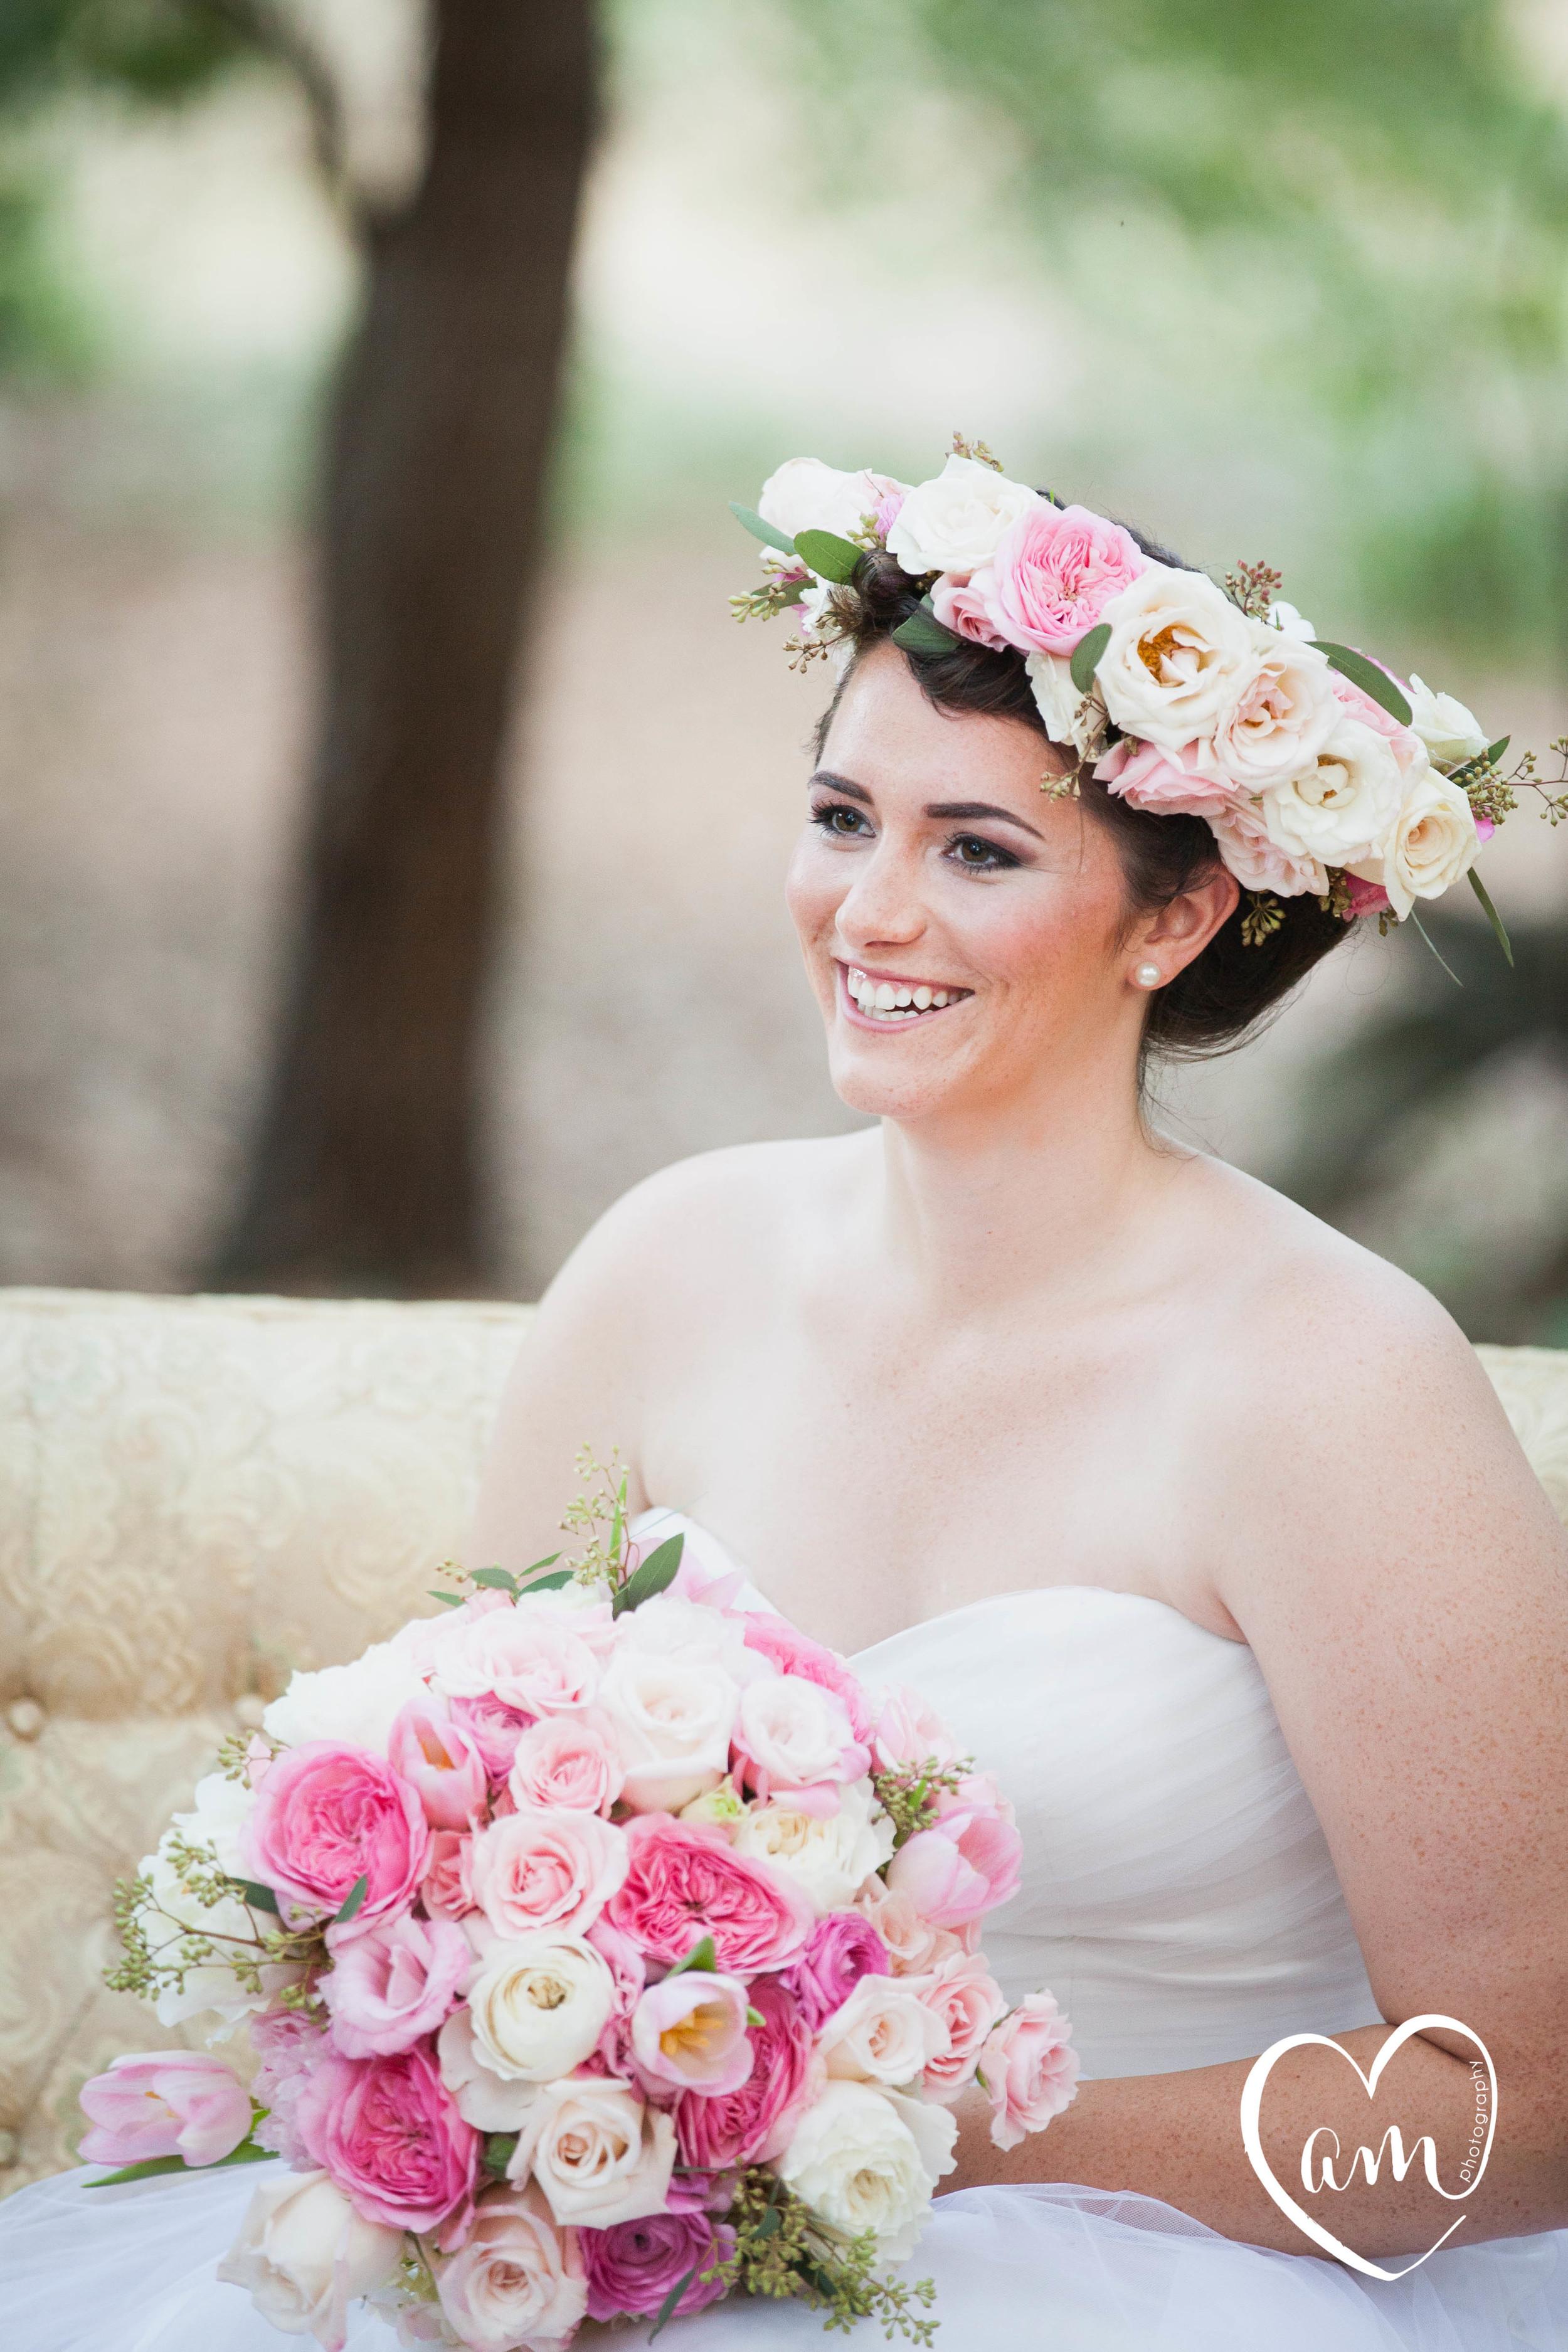 Floral Crown photographed by Florida Destination Wedding Photographer